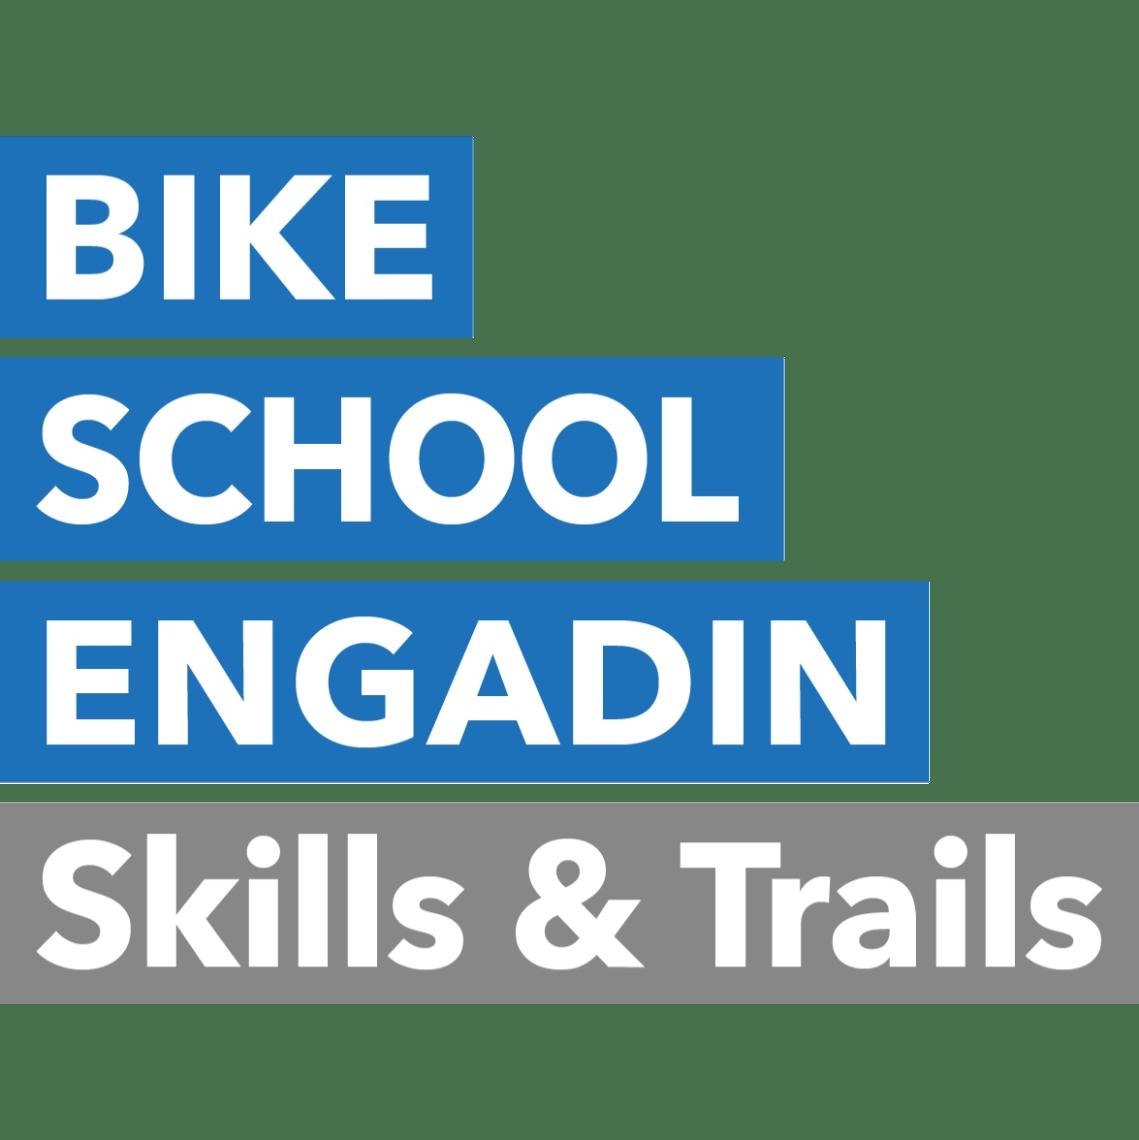 Bike School Engadin